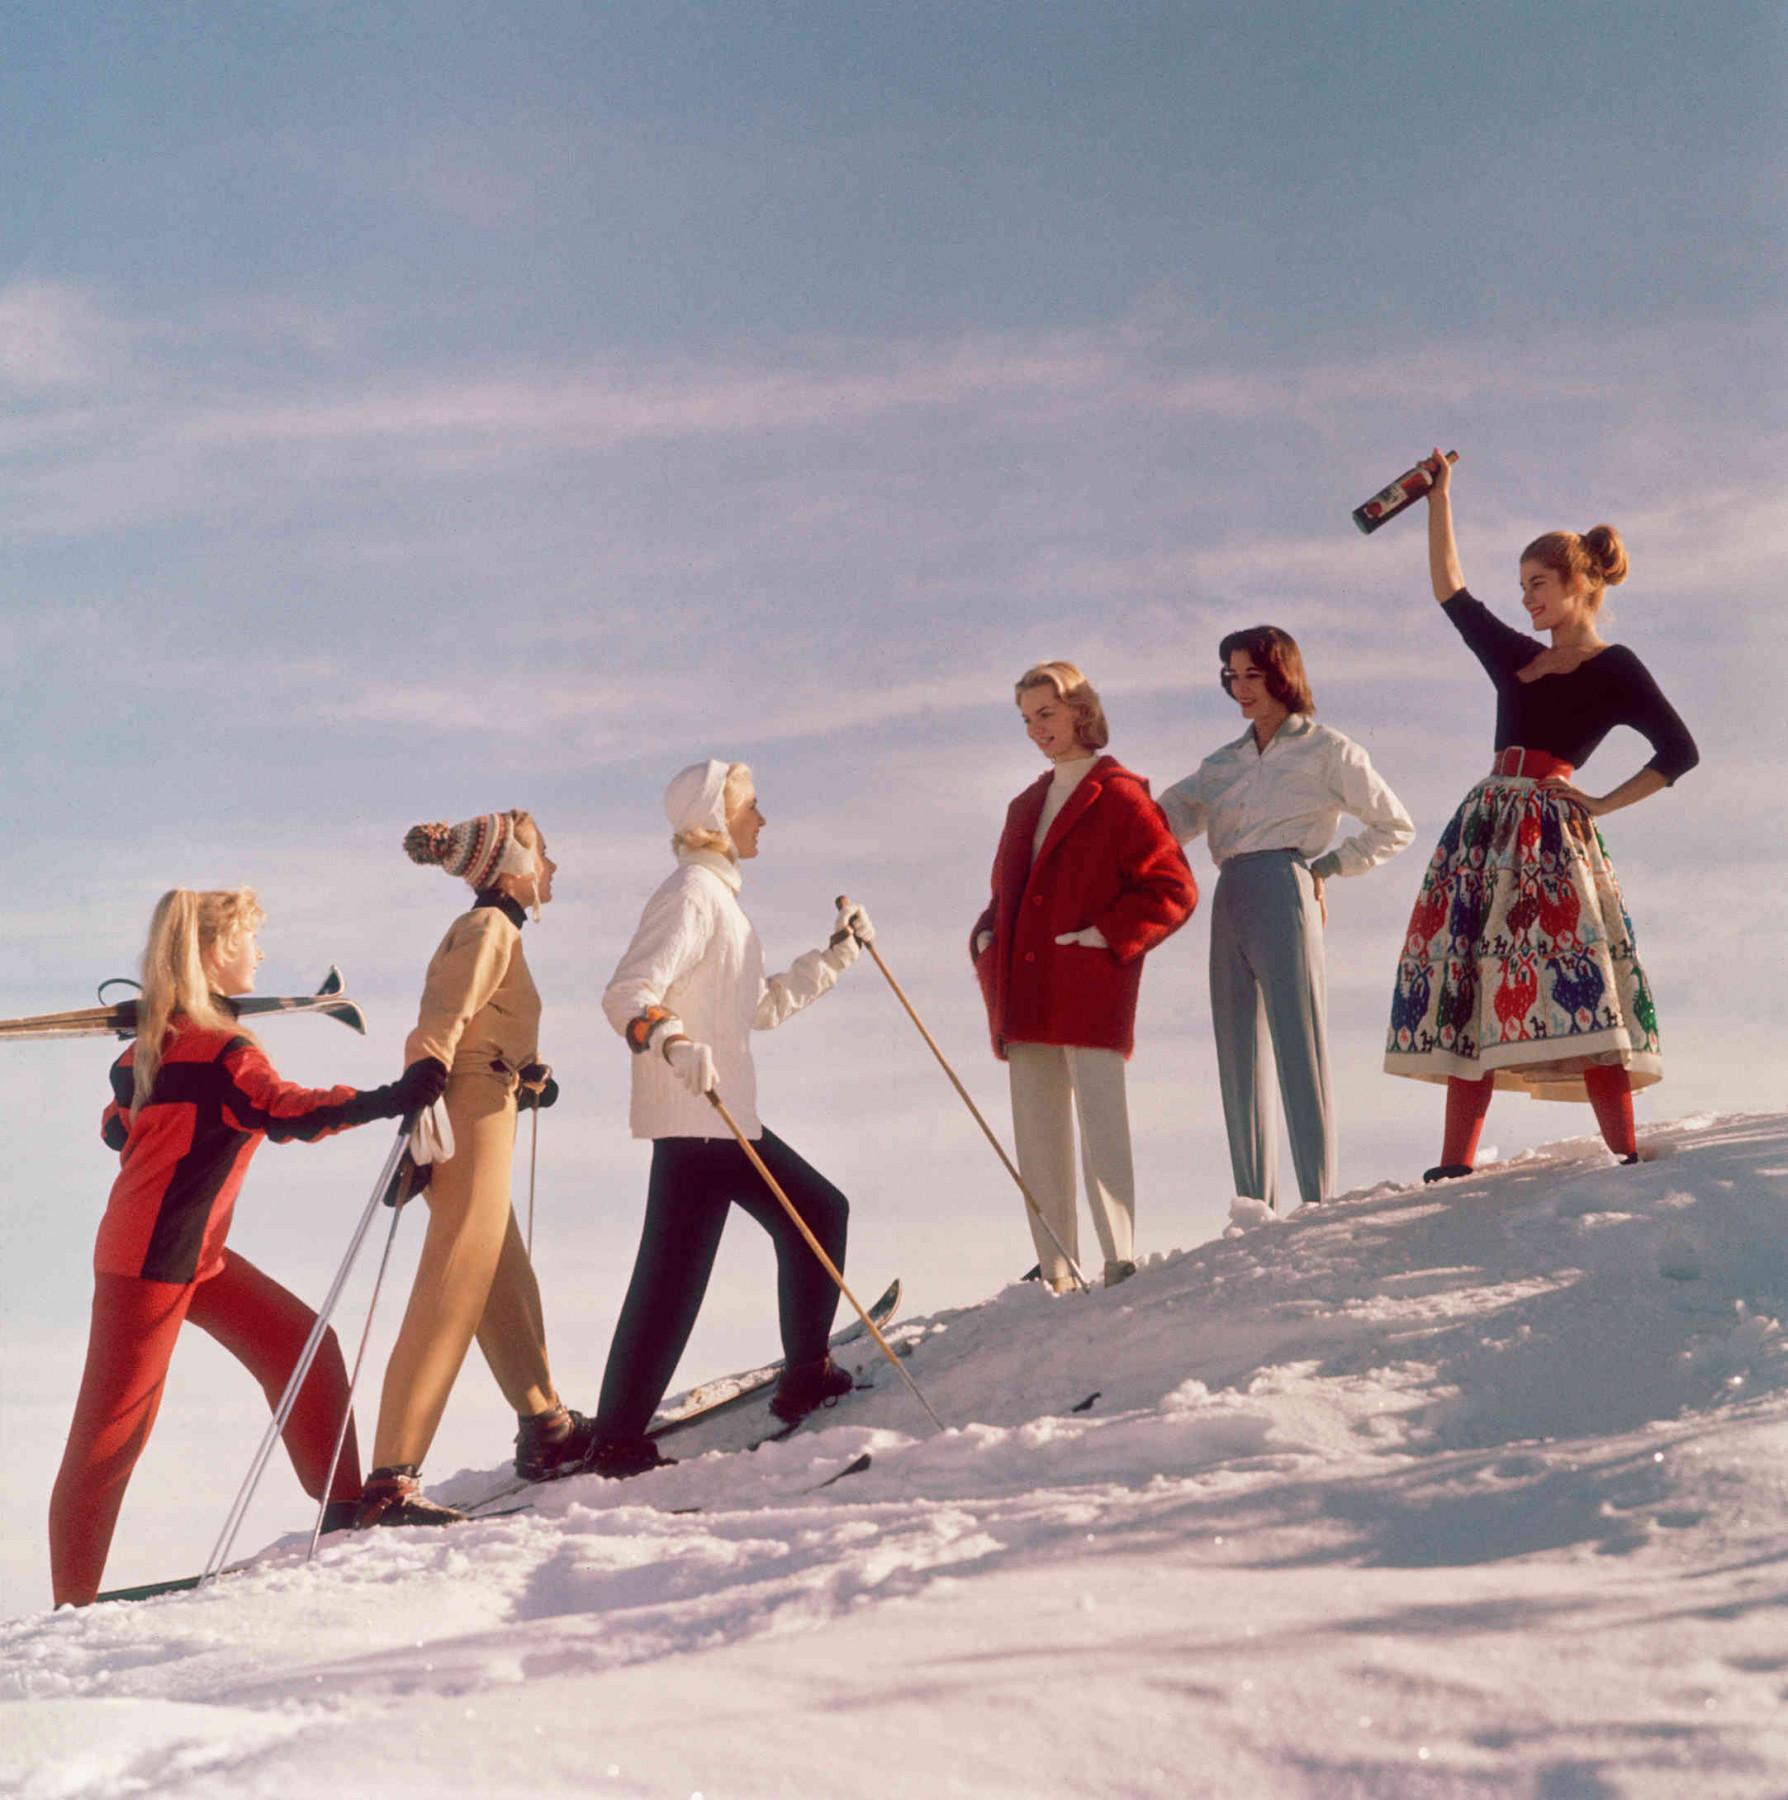 Fashion in the Alps